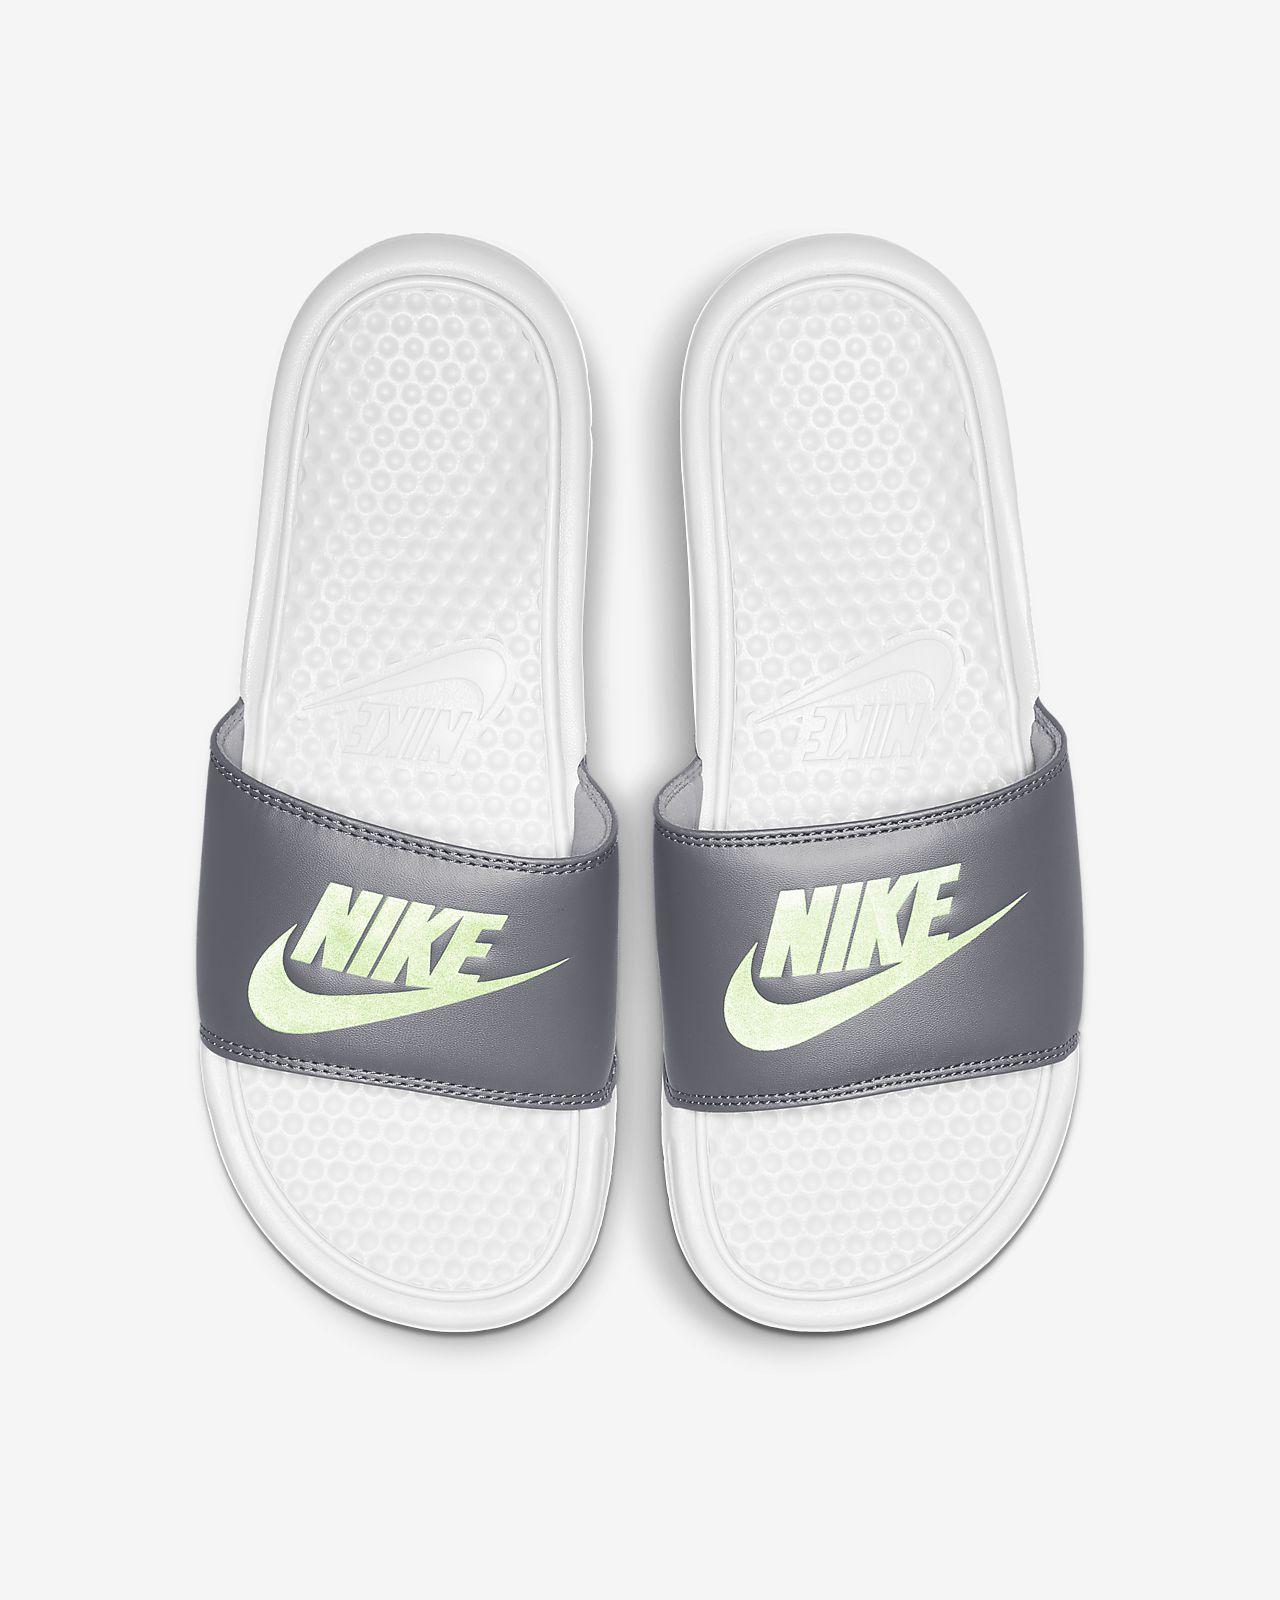 aaf095504e0c Sandalia para mujer Nike Benassi